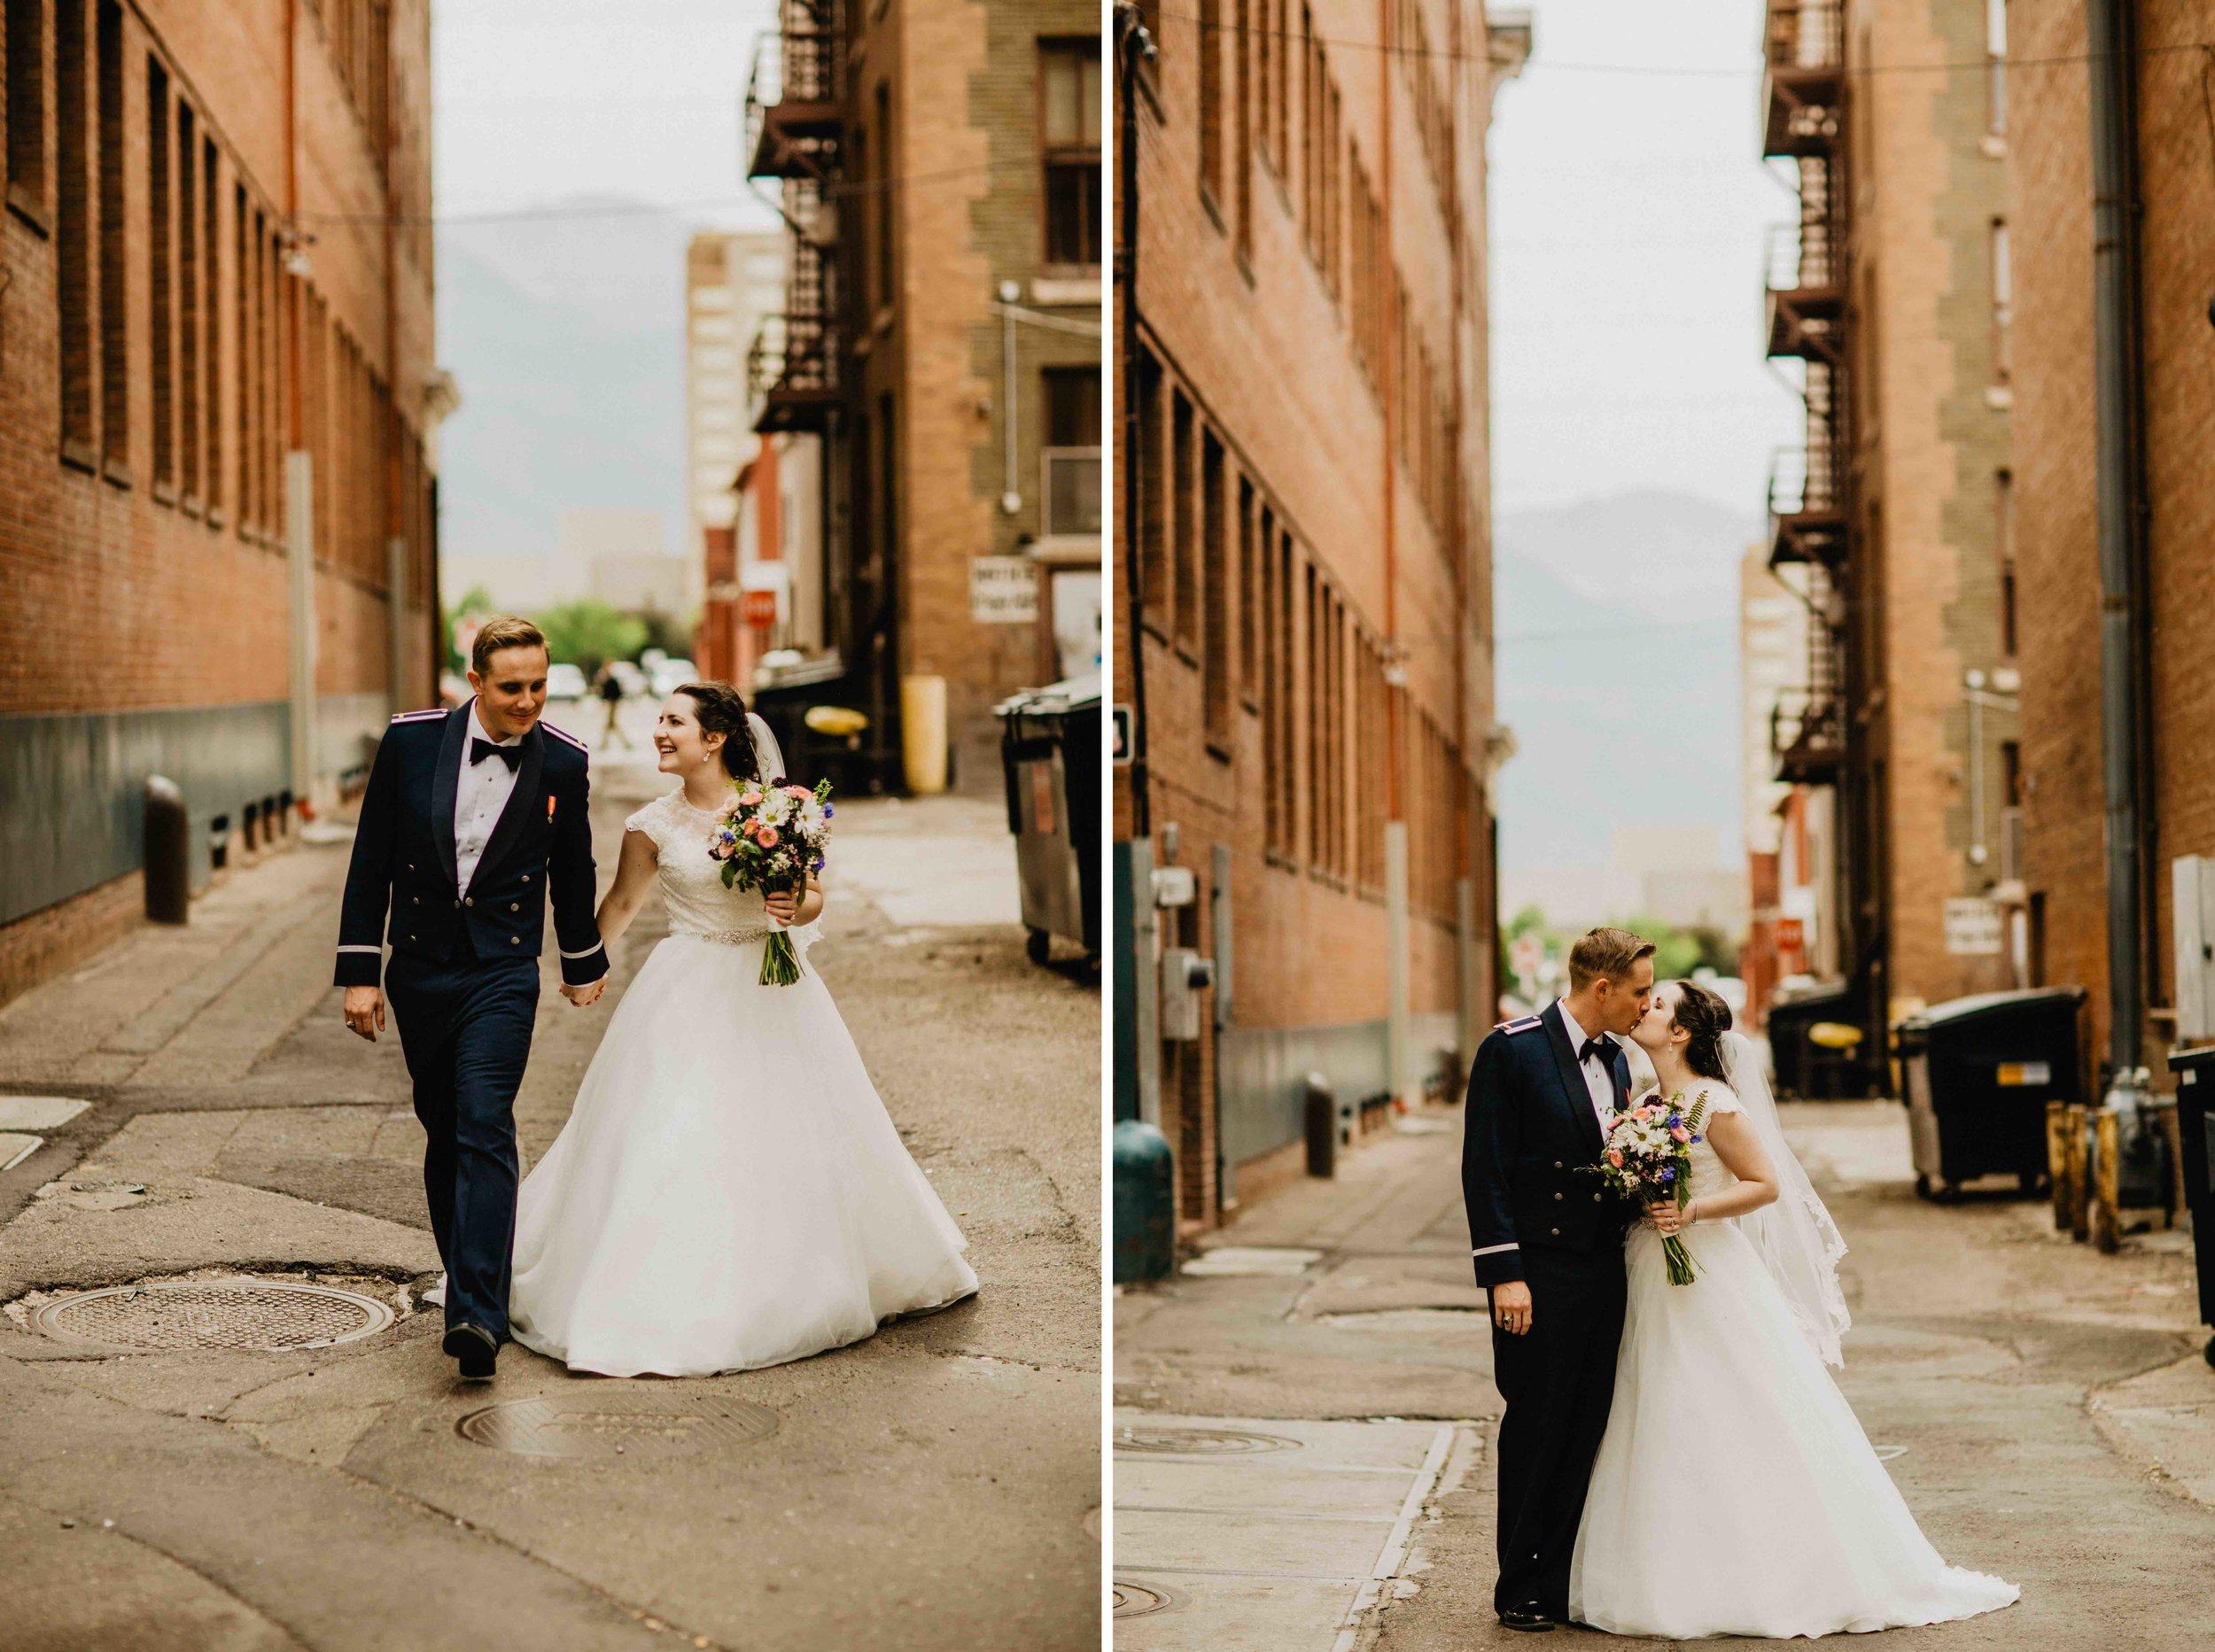 607A6031-colorado-wedding-photographer-denver-springs-vail--colorado-wedding-photographer-denver-springs-vail-.jpeg